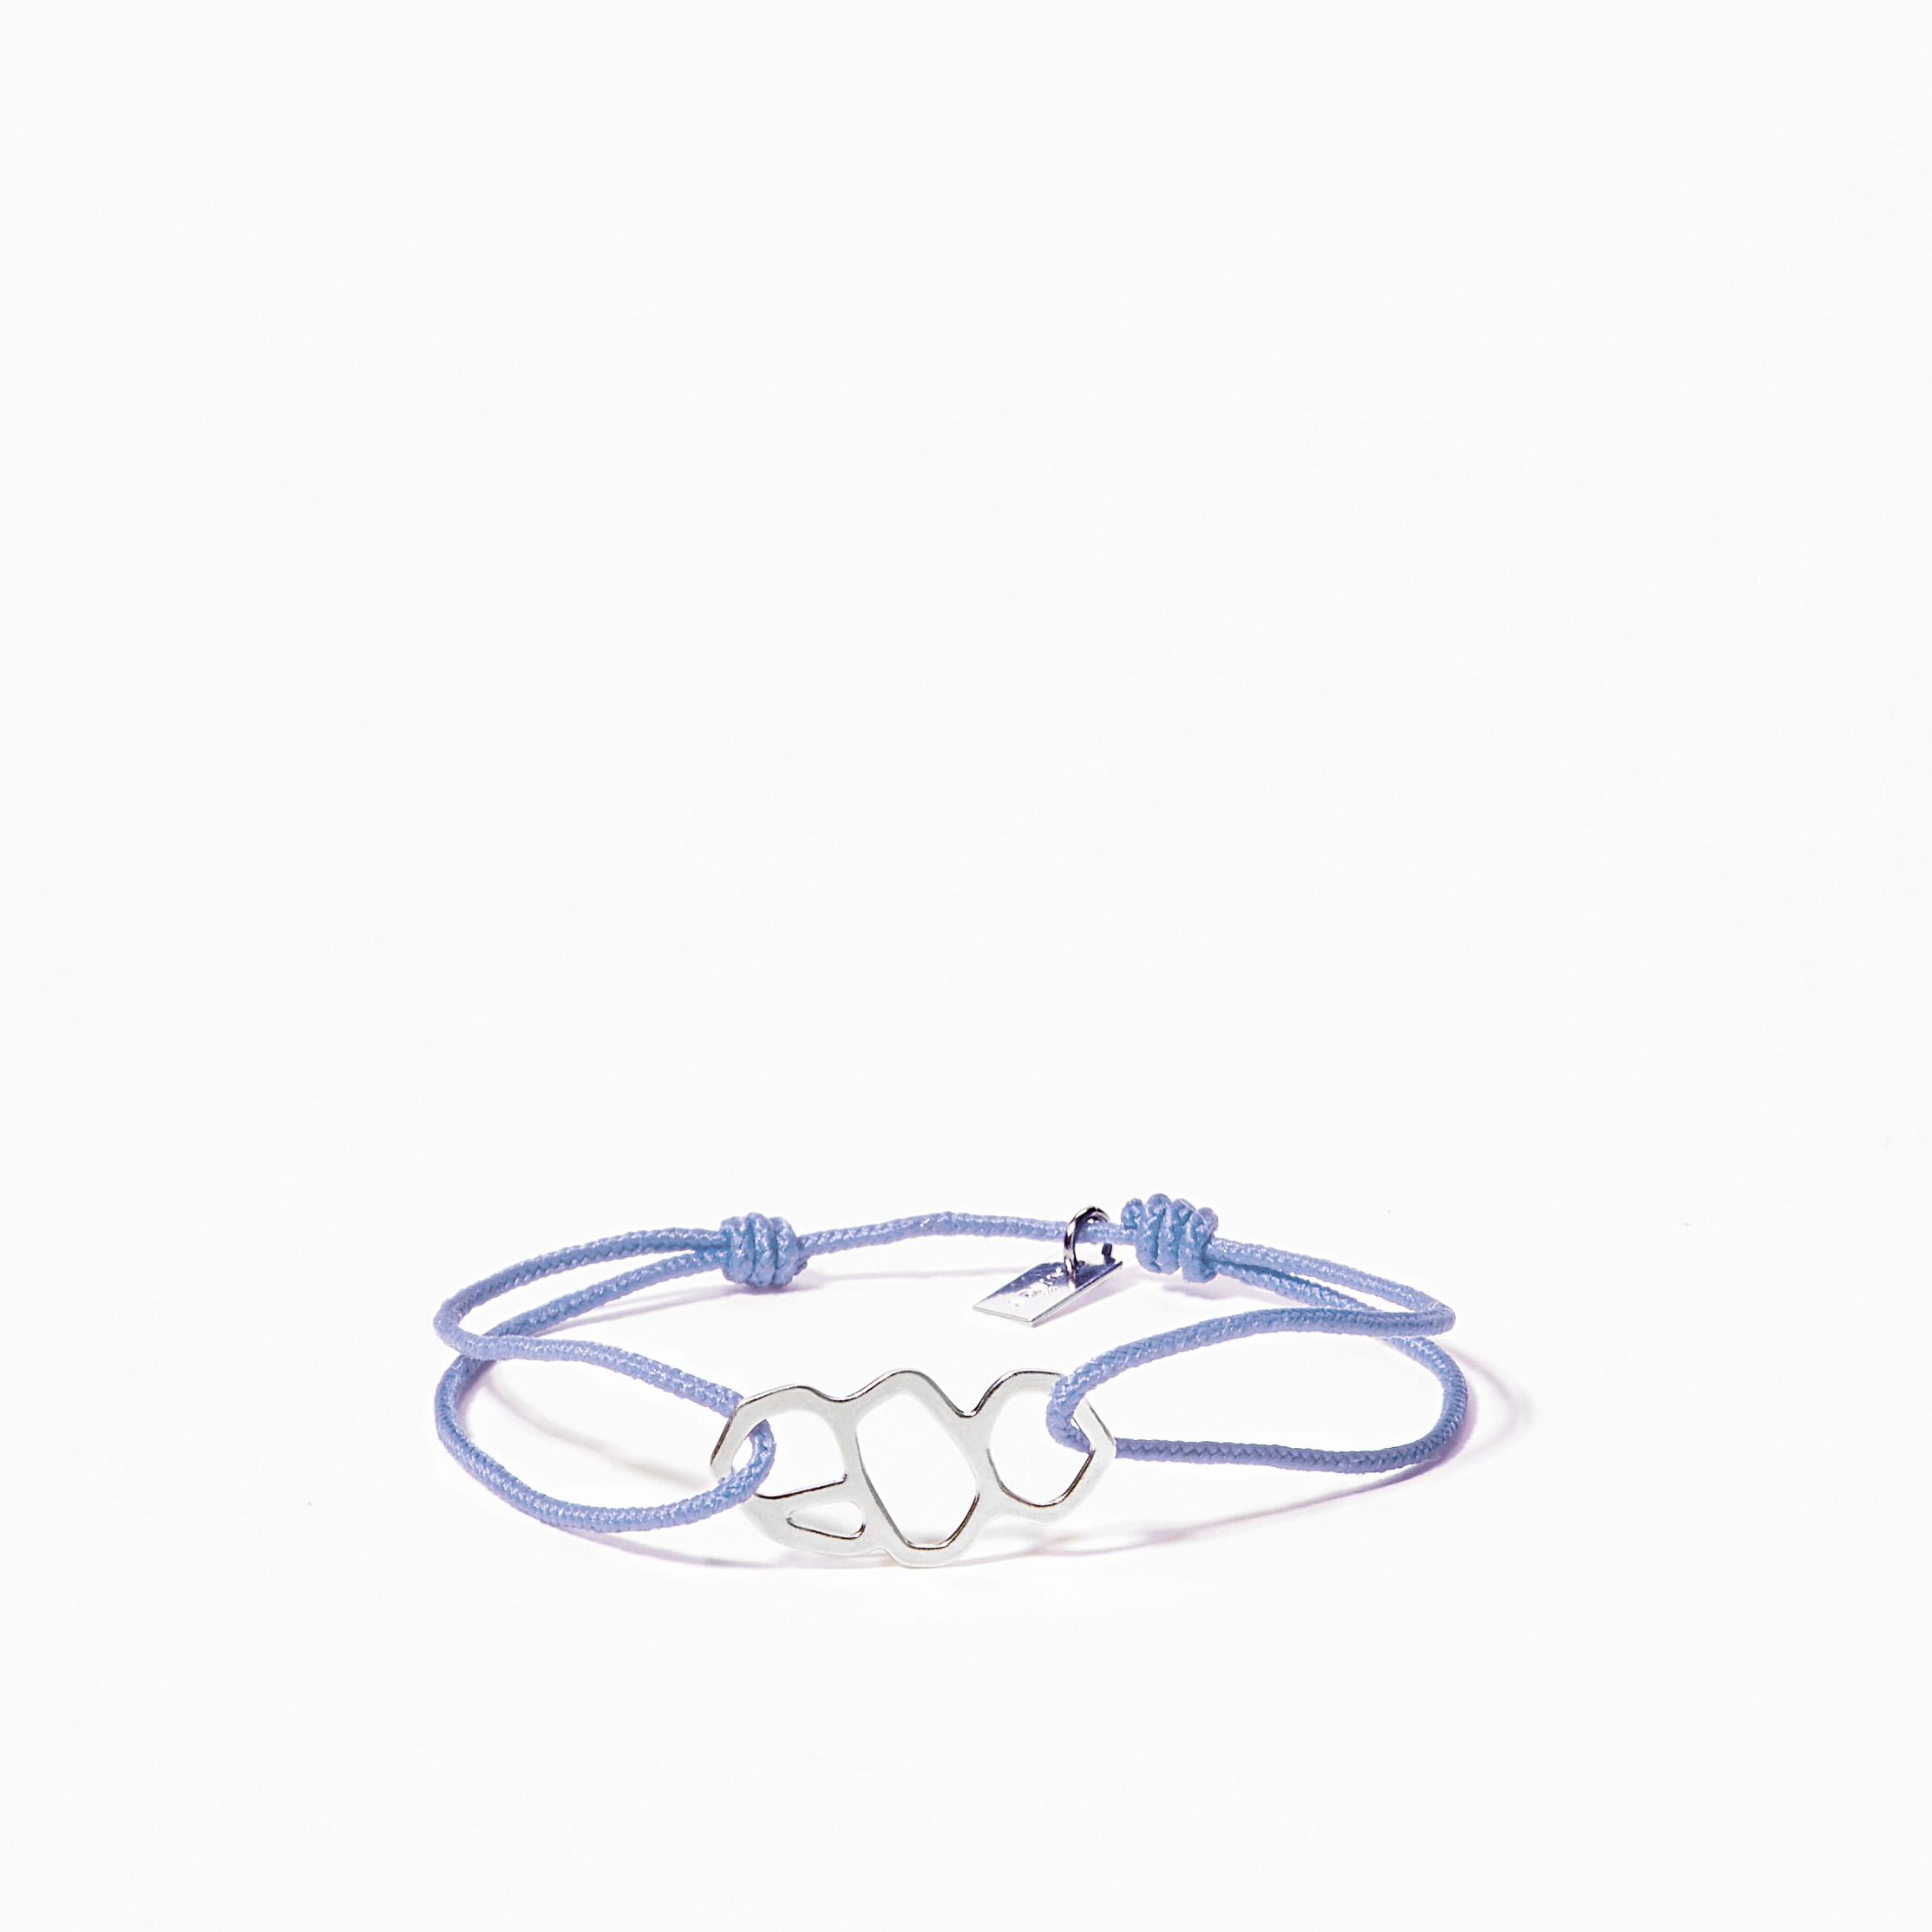 Bracelet bleu carre adayin for Carre bleu